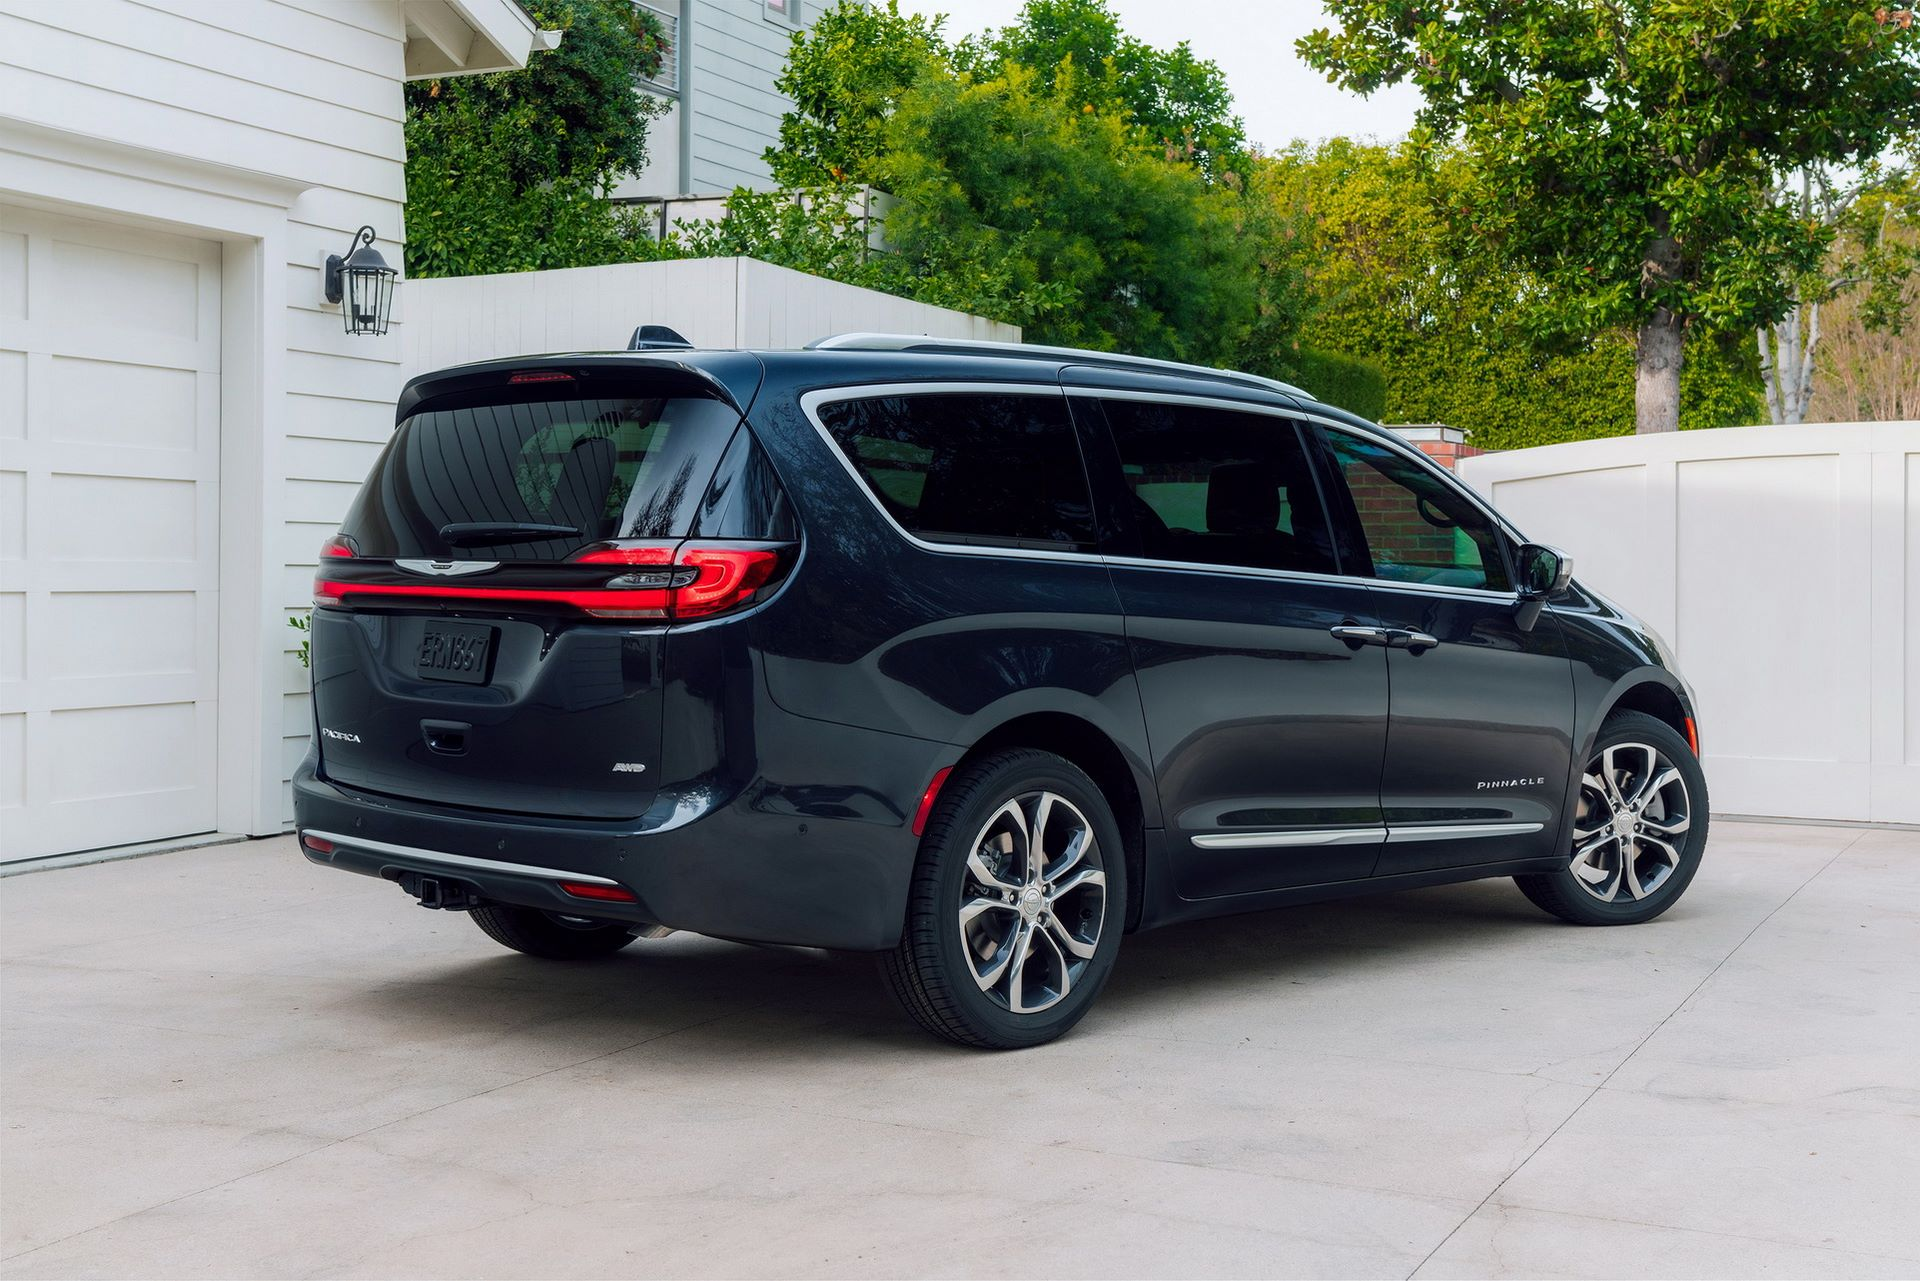 2021-Chrysler-Pacifica-13